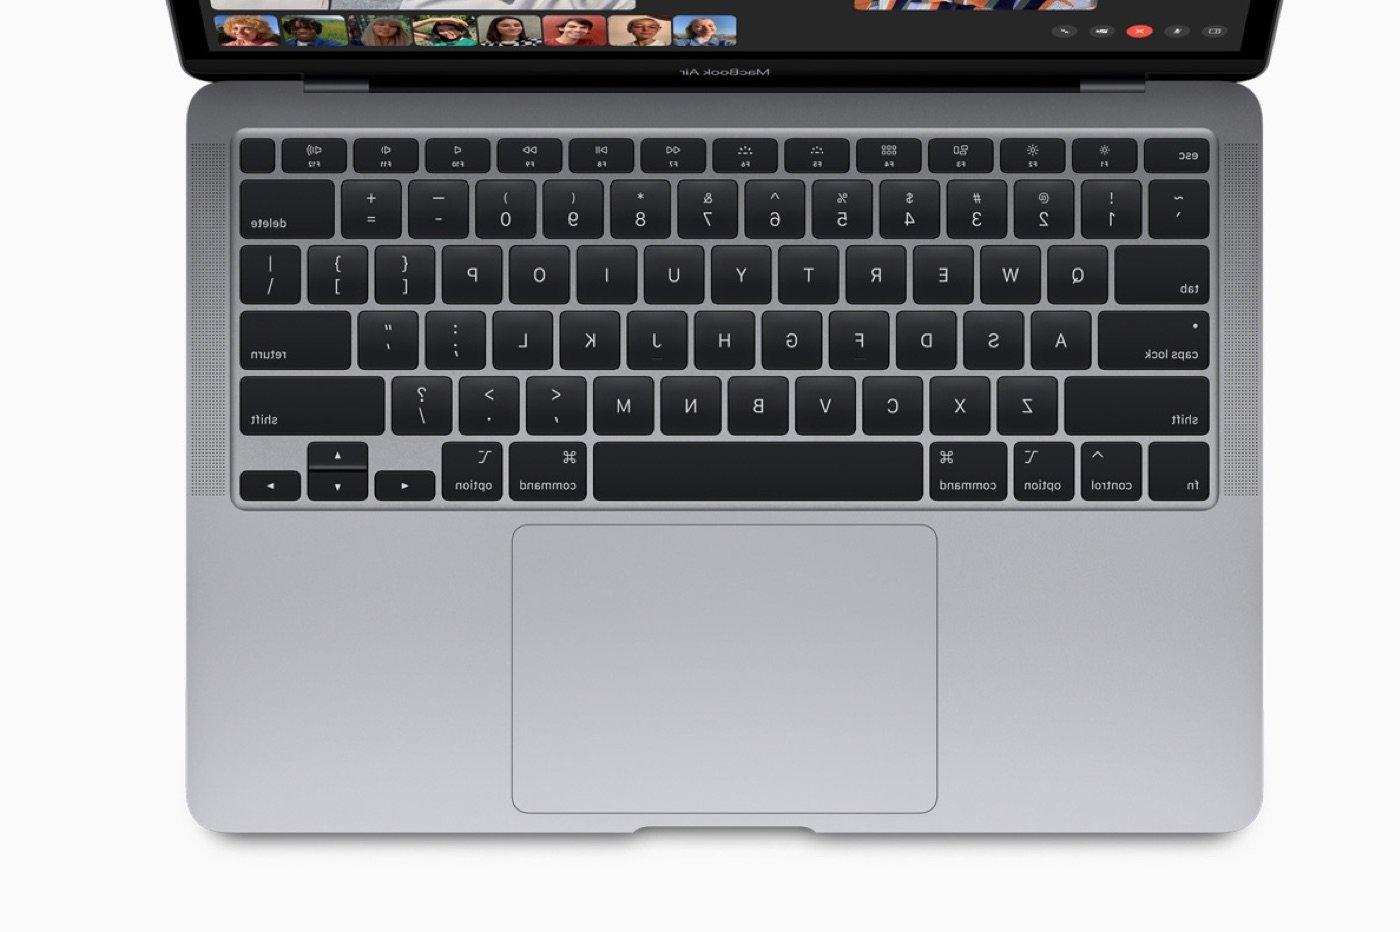 Clavier du MacBook Air 2020